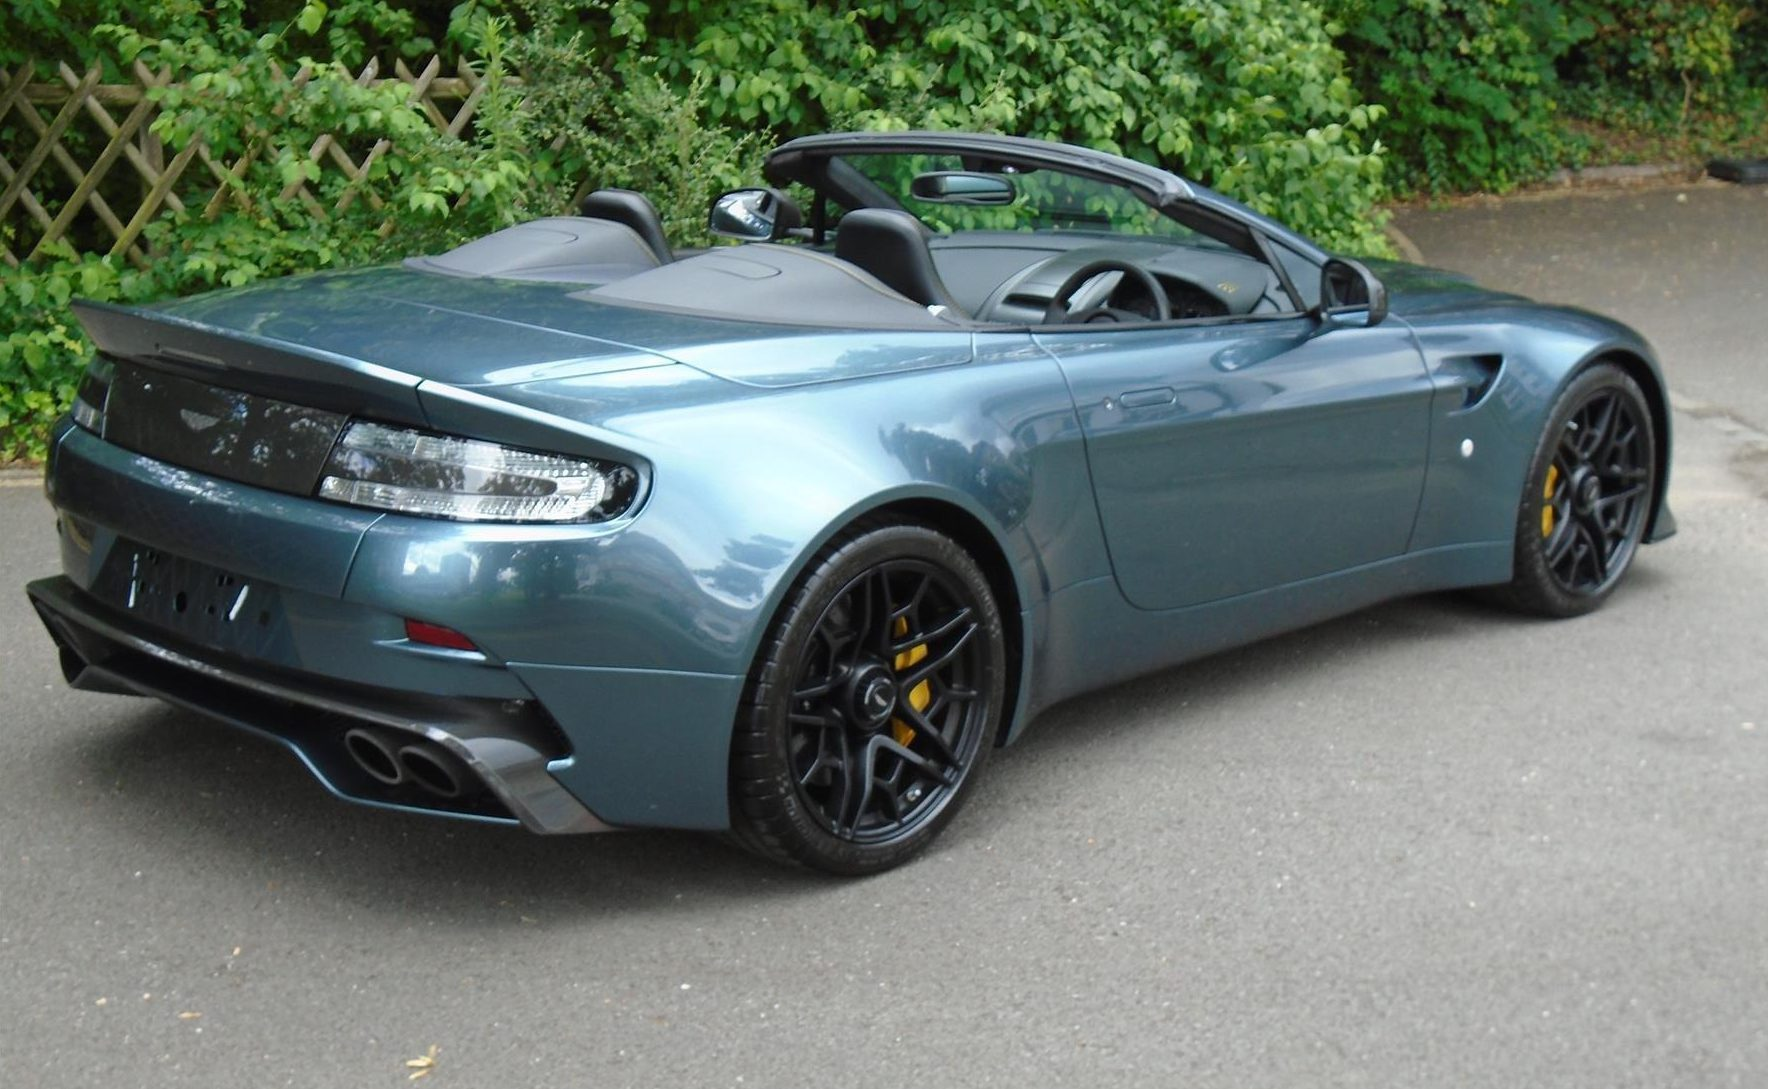 Aston_Martin_V12_Vantage_V600_Roadster_sale-0011